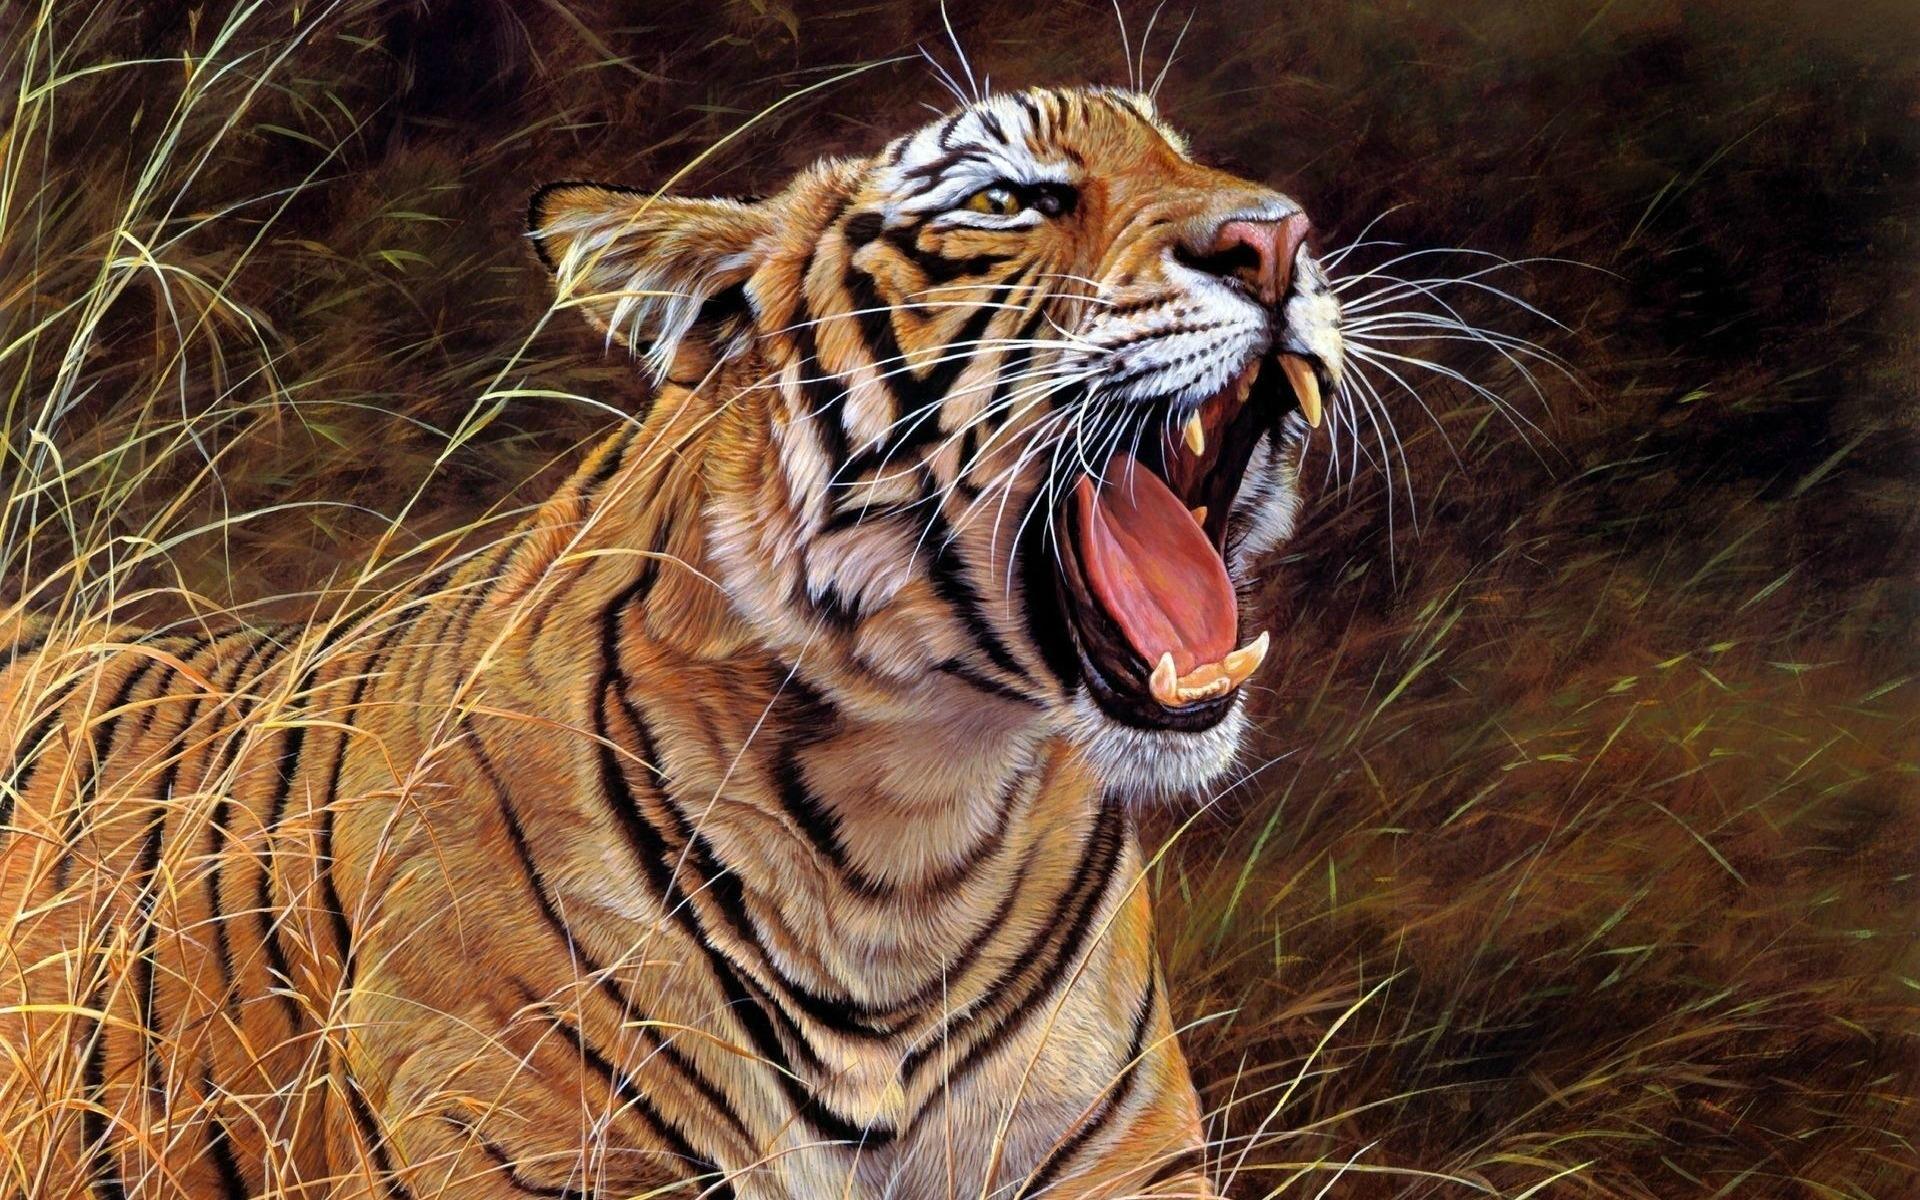 Growling white tiger wallpaper